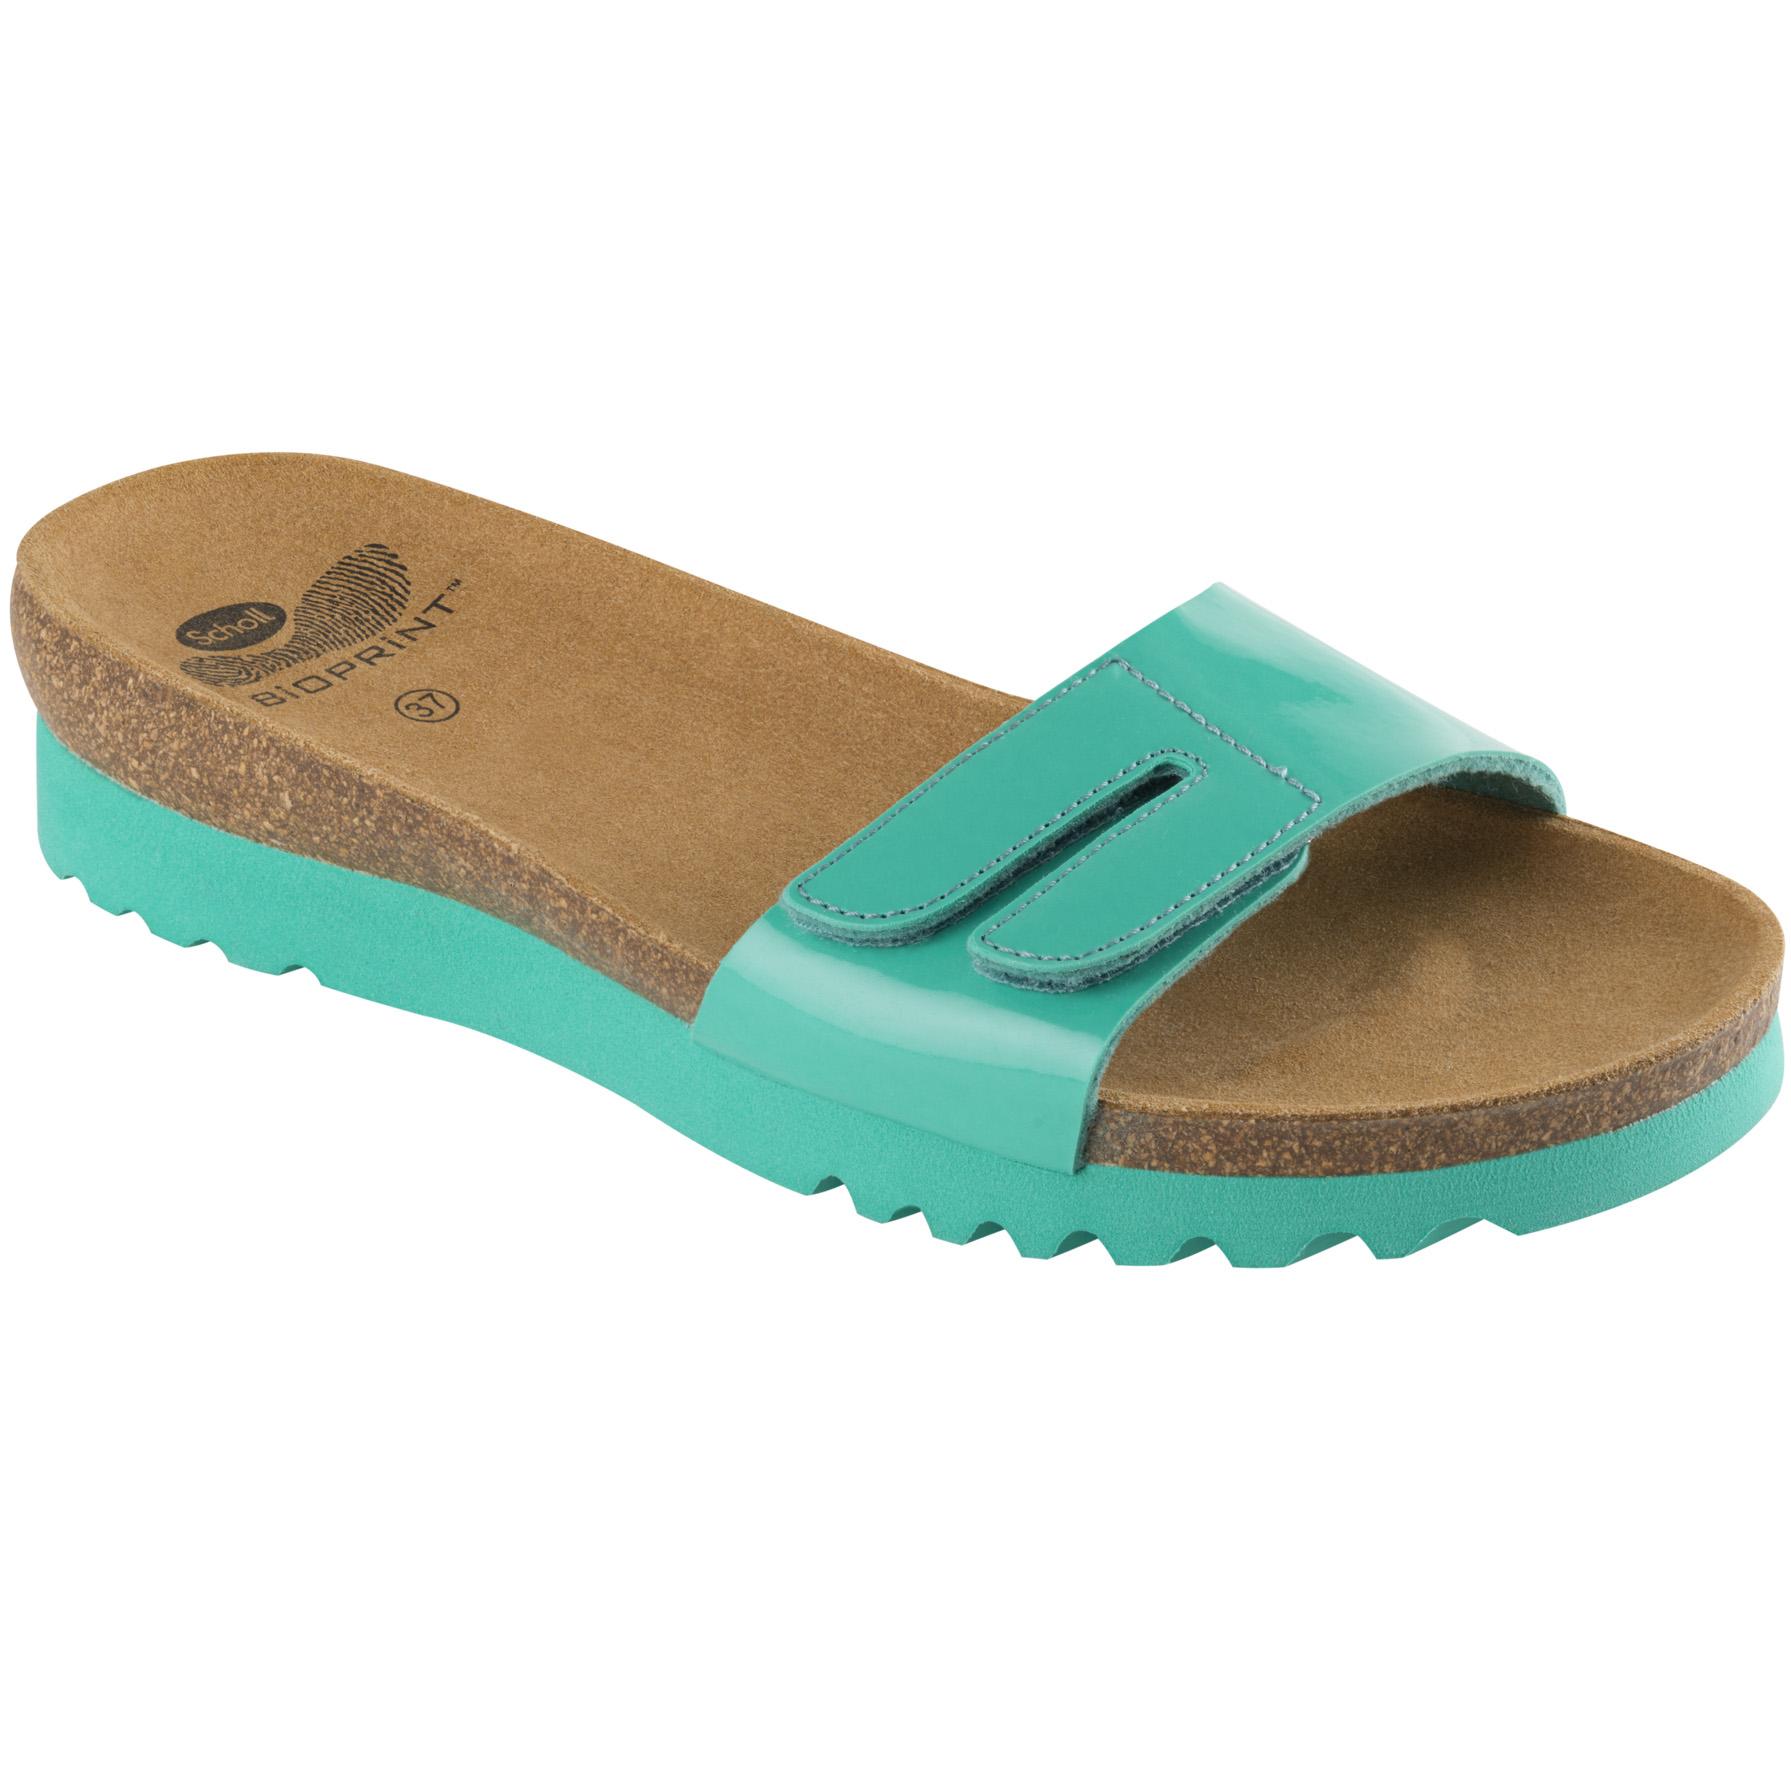 Dr Scholl Shoes Luwin ΜπλεΓυναικεία Ανατομικά Παπούτσια Χαρίζουν Σωστή Στάση & Φυσικό Χωρίς Πόνο Βάδισμα 1 Ζευγάρι – 39